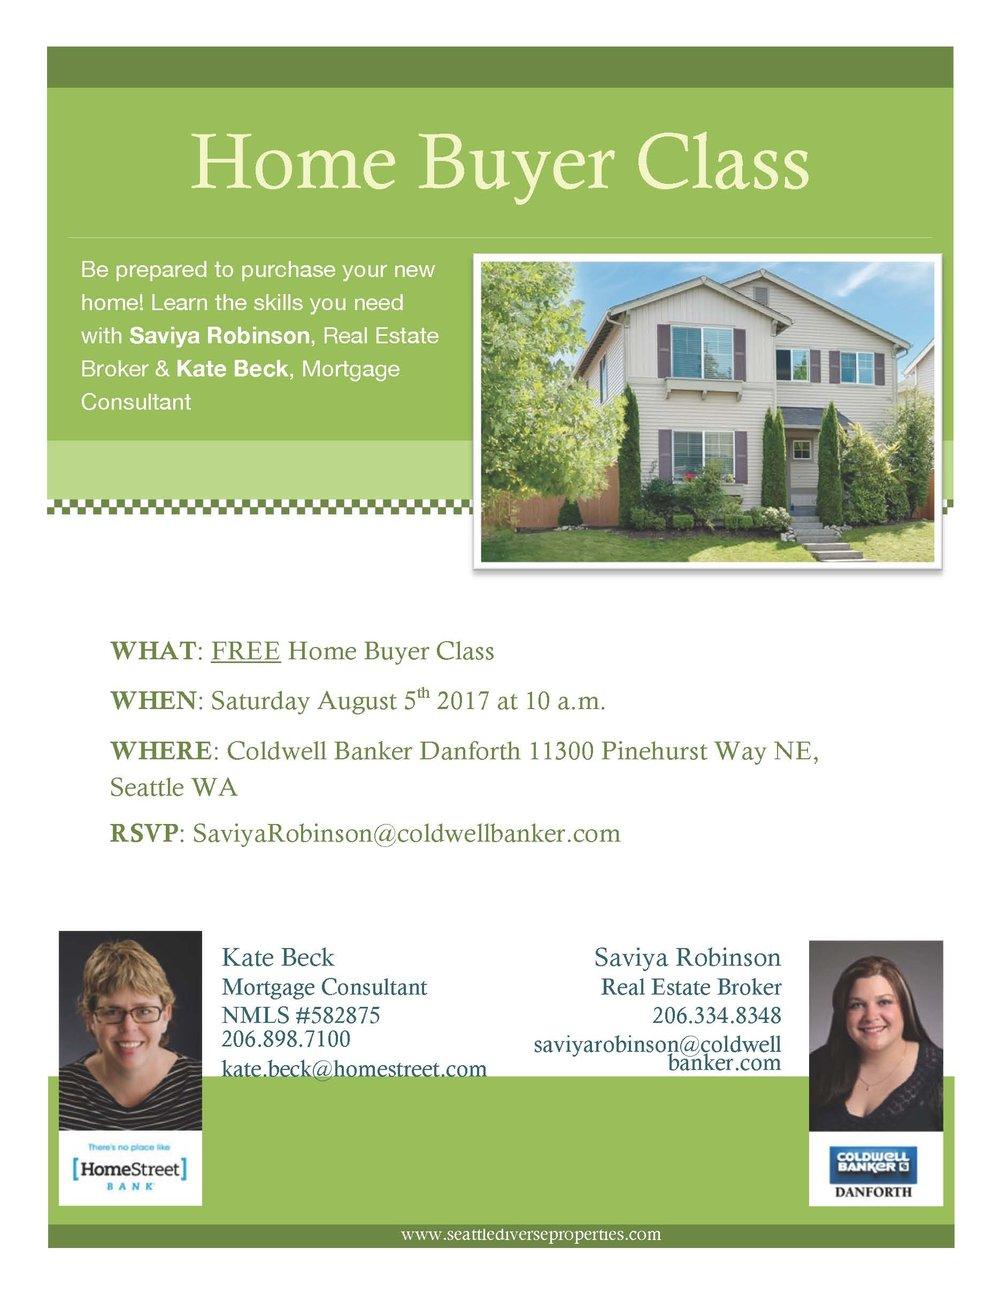 saviya-robinson-home-buyer-class.jpg